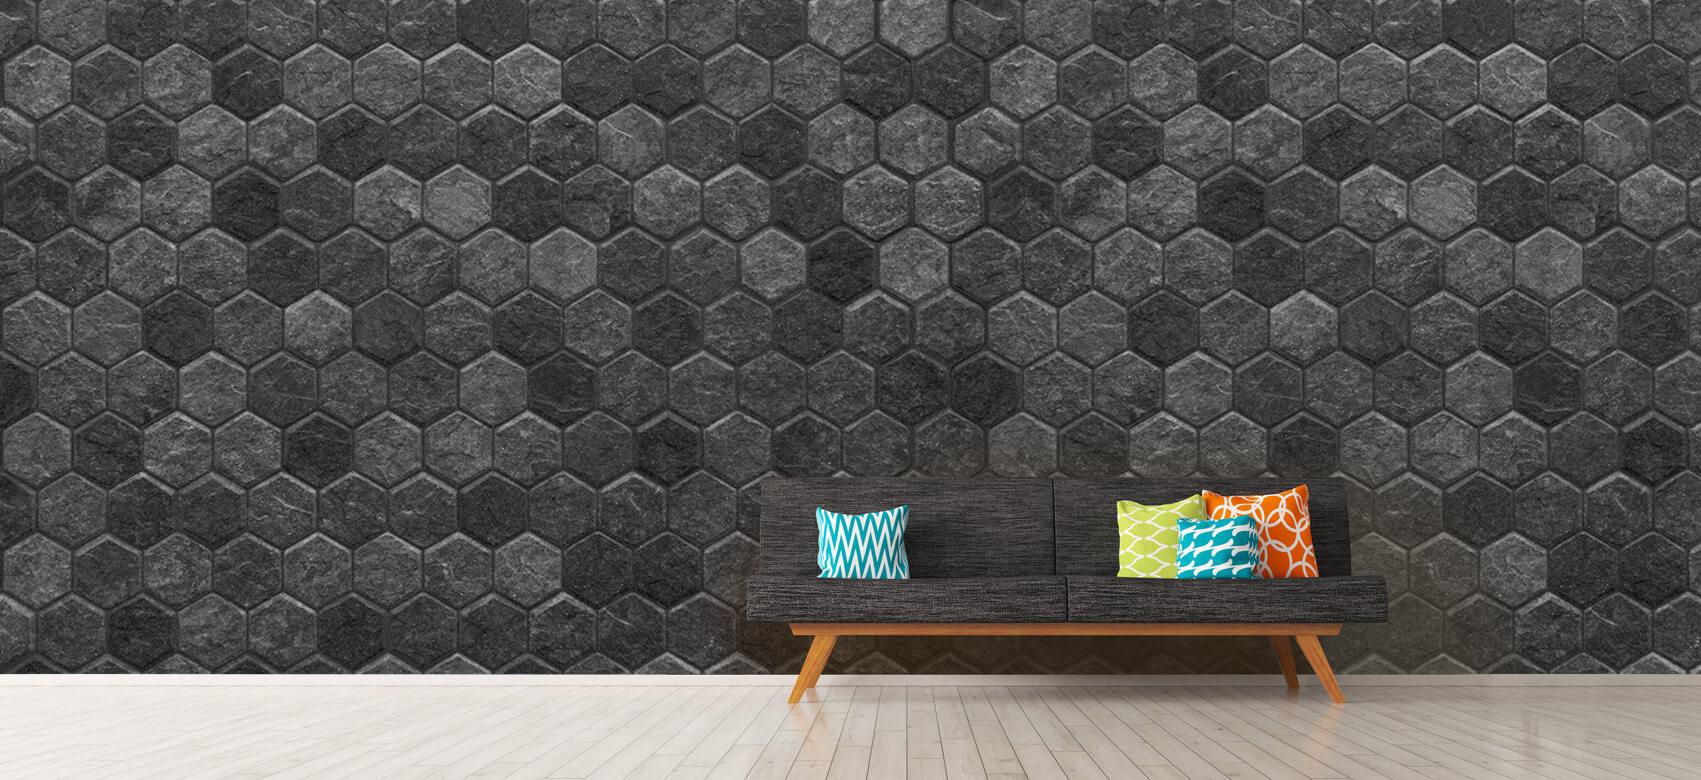 Beton, hout en steen Kleine zwarte steentjes 13